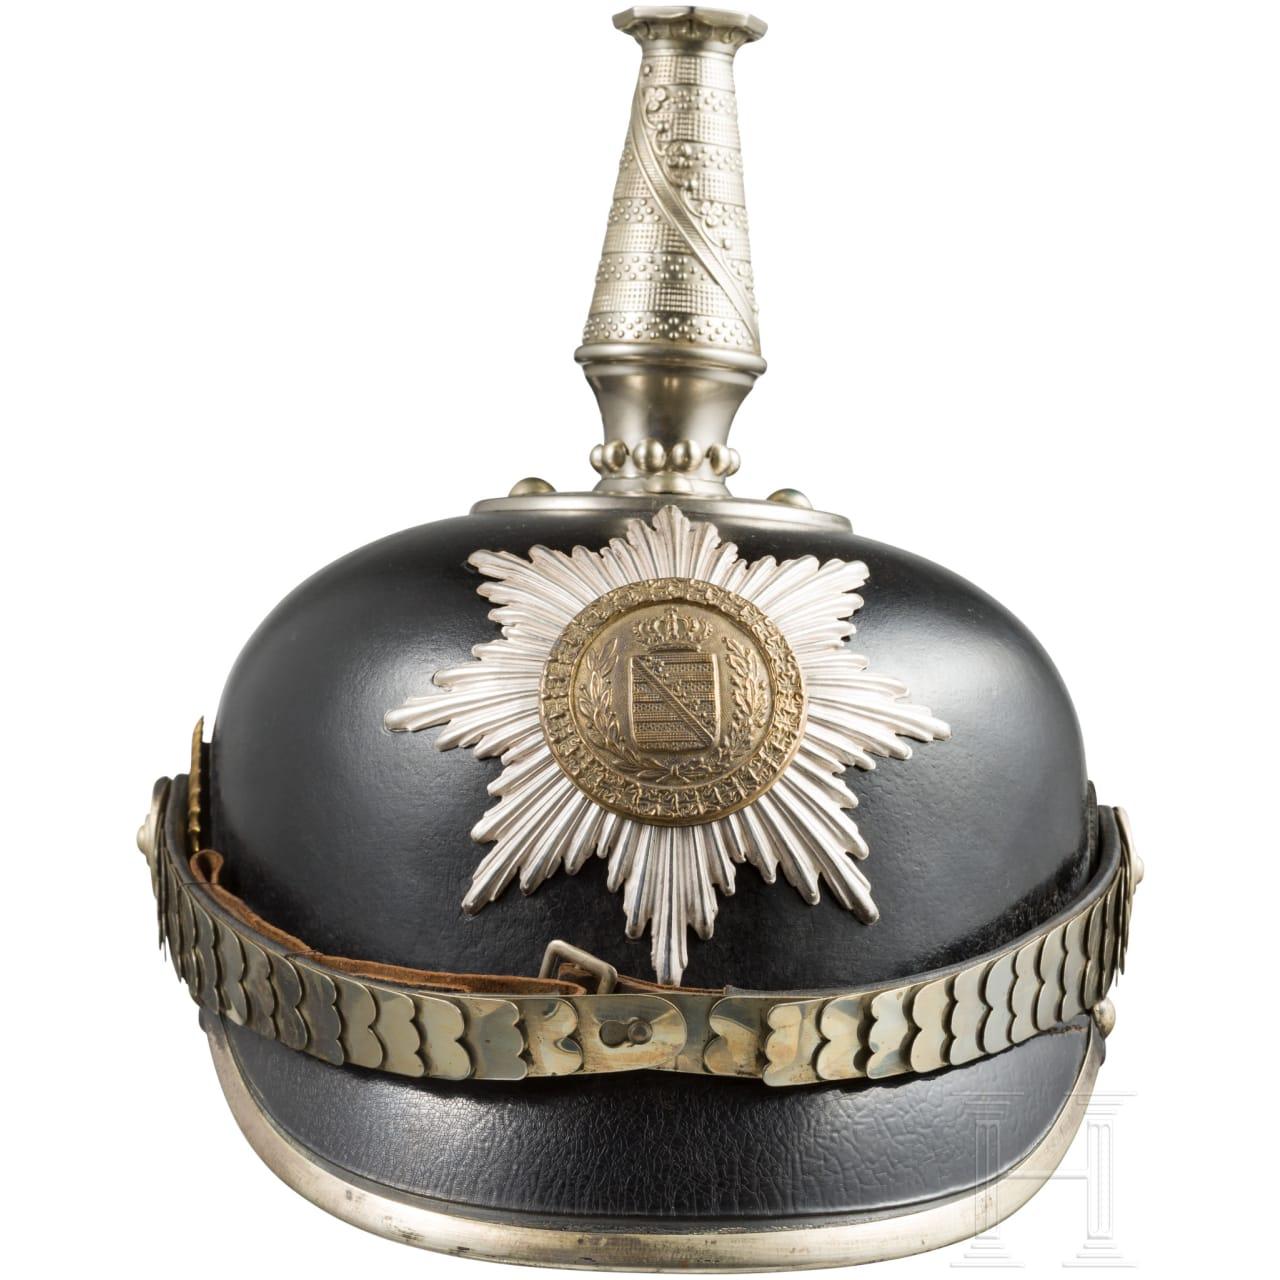 Helmet for troopers in the Ducal Infantry Regiment, c. 1890